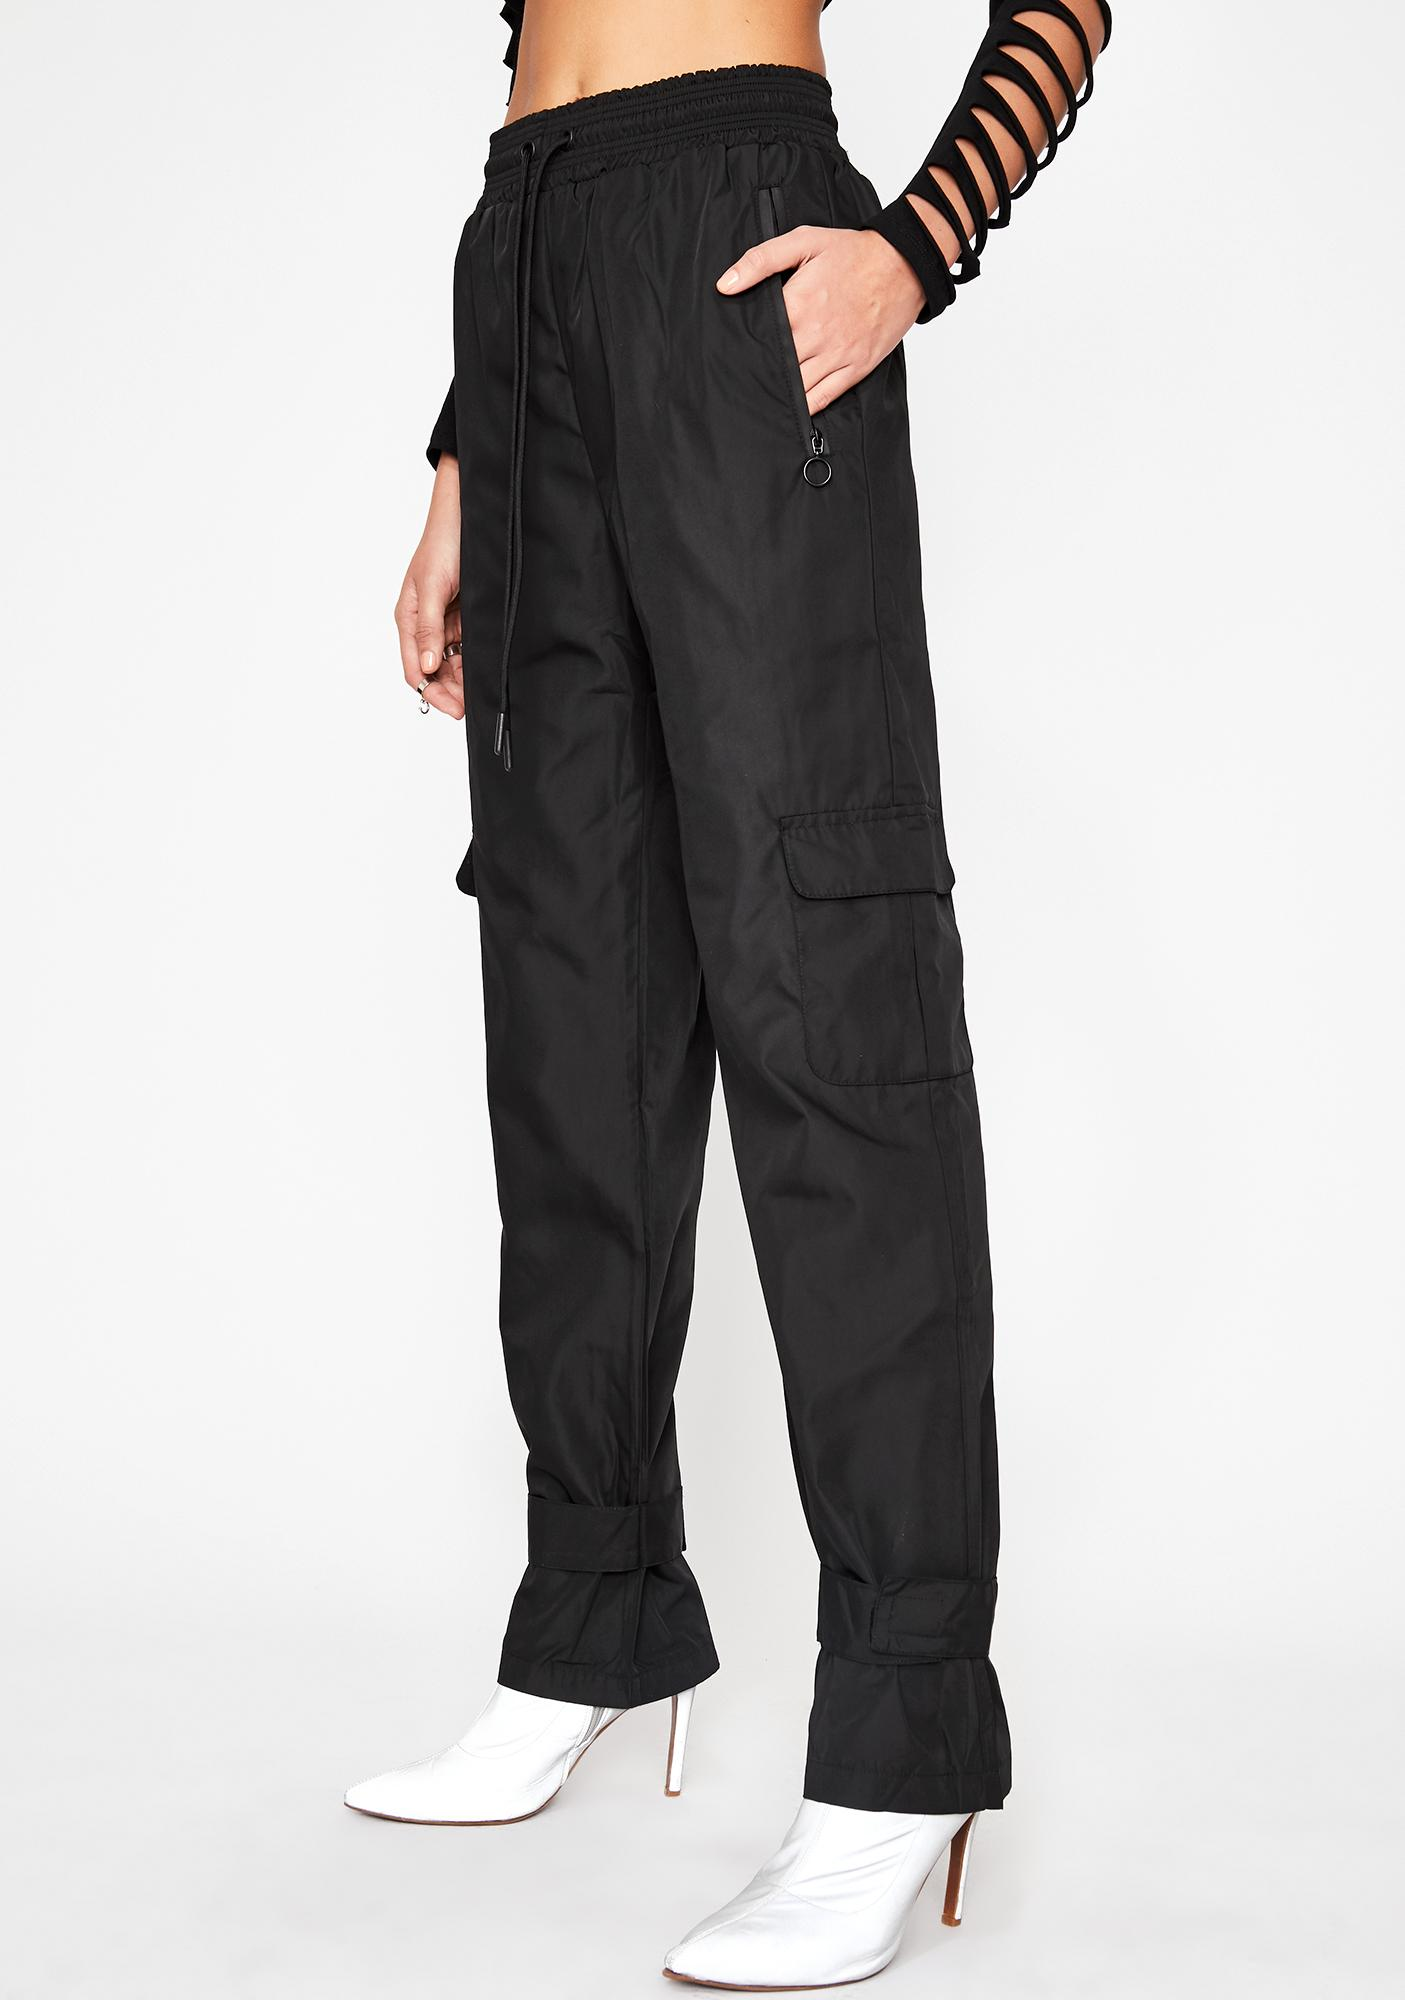 Dark Toxic Delivery Cargo Pants